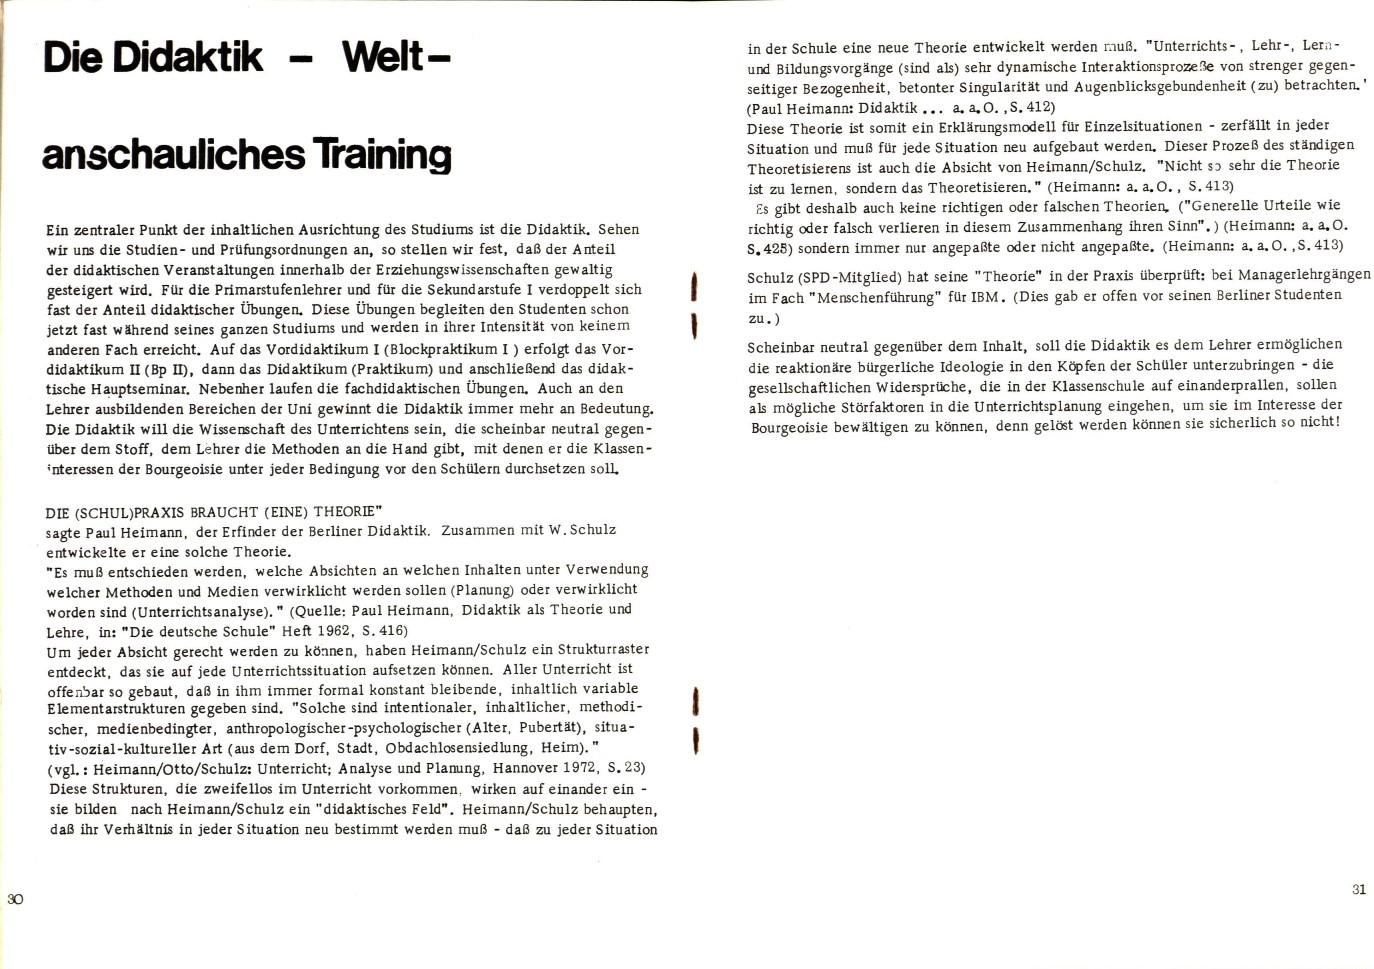 KSV_1975_Lehrerausbildung_16